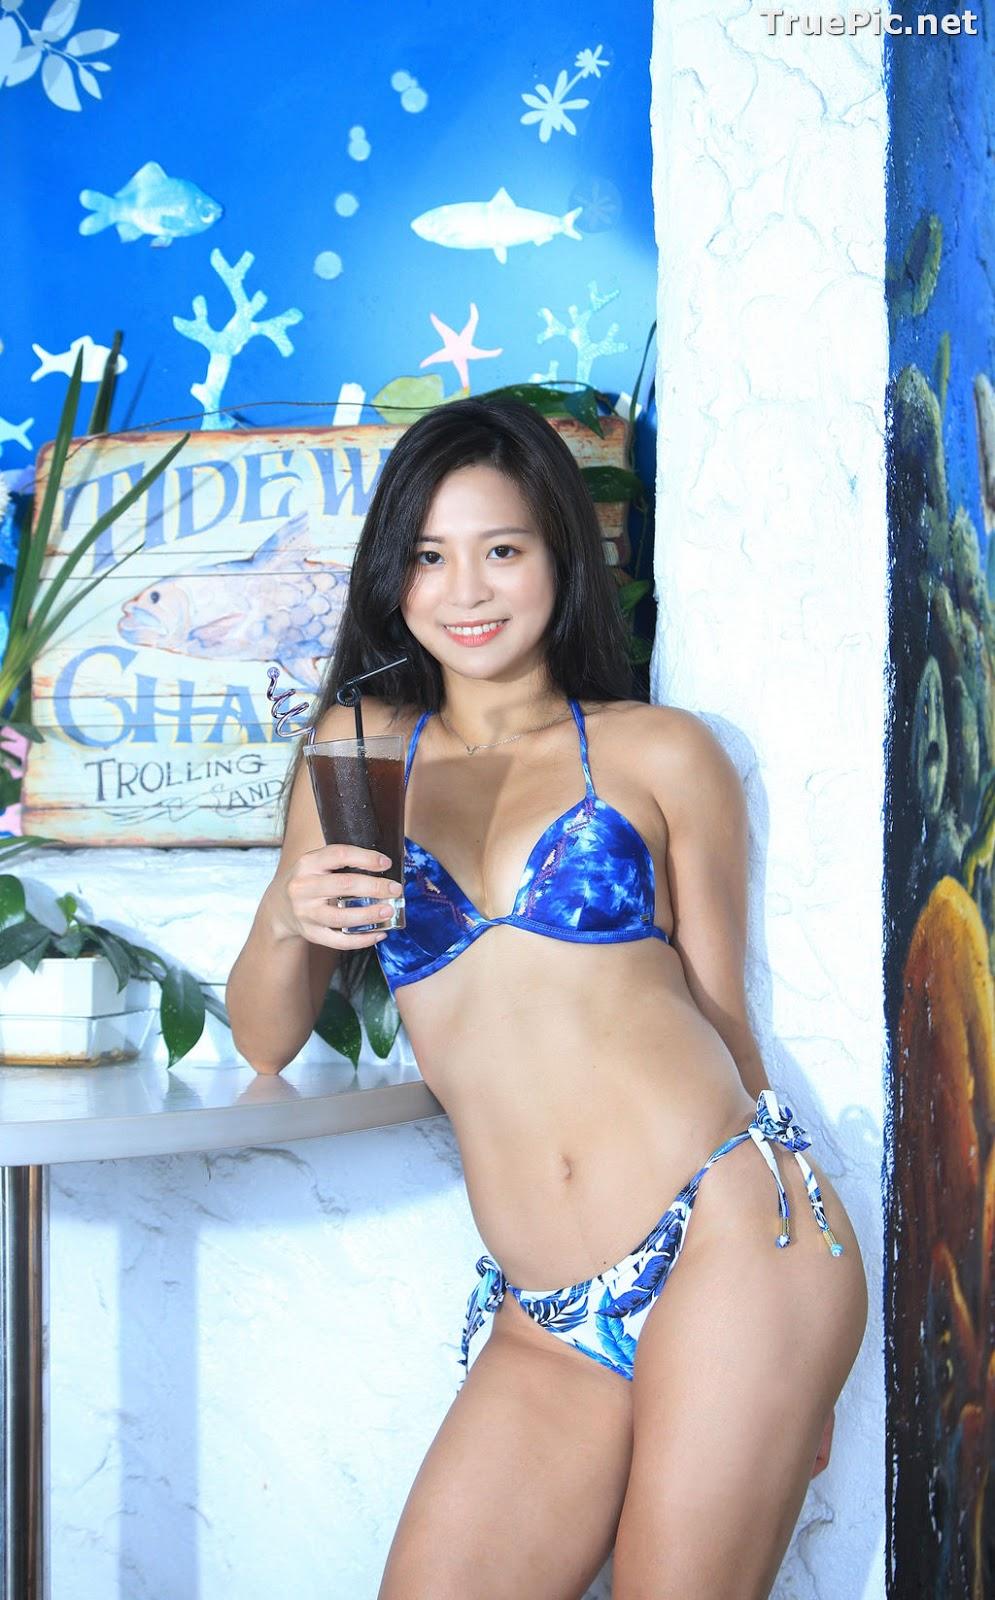 Image Taiwanese Model - Shelly - Beautiful Bodybuilding Bikini Girl - TruePic.net - Picture-49